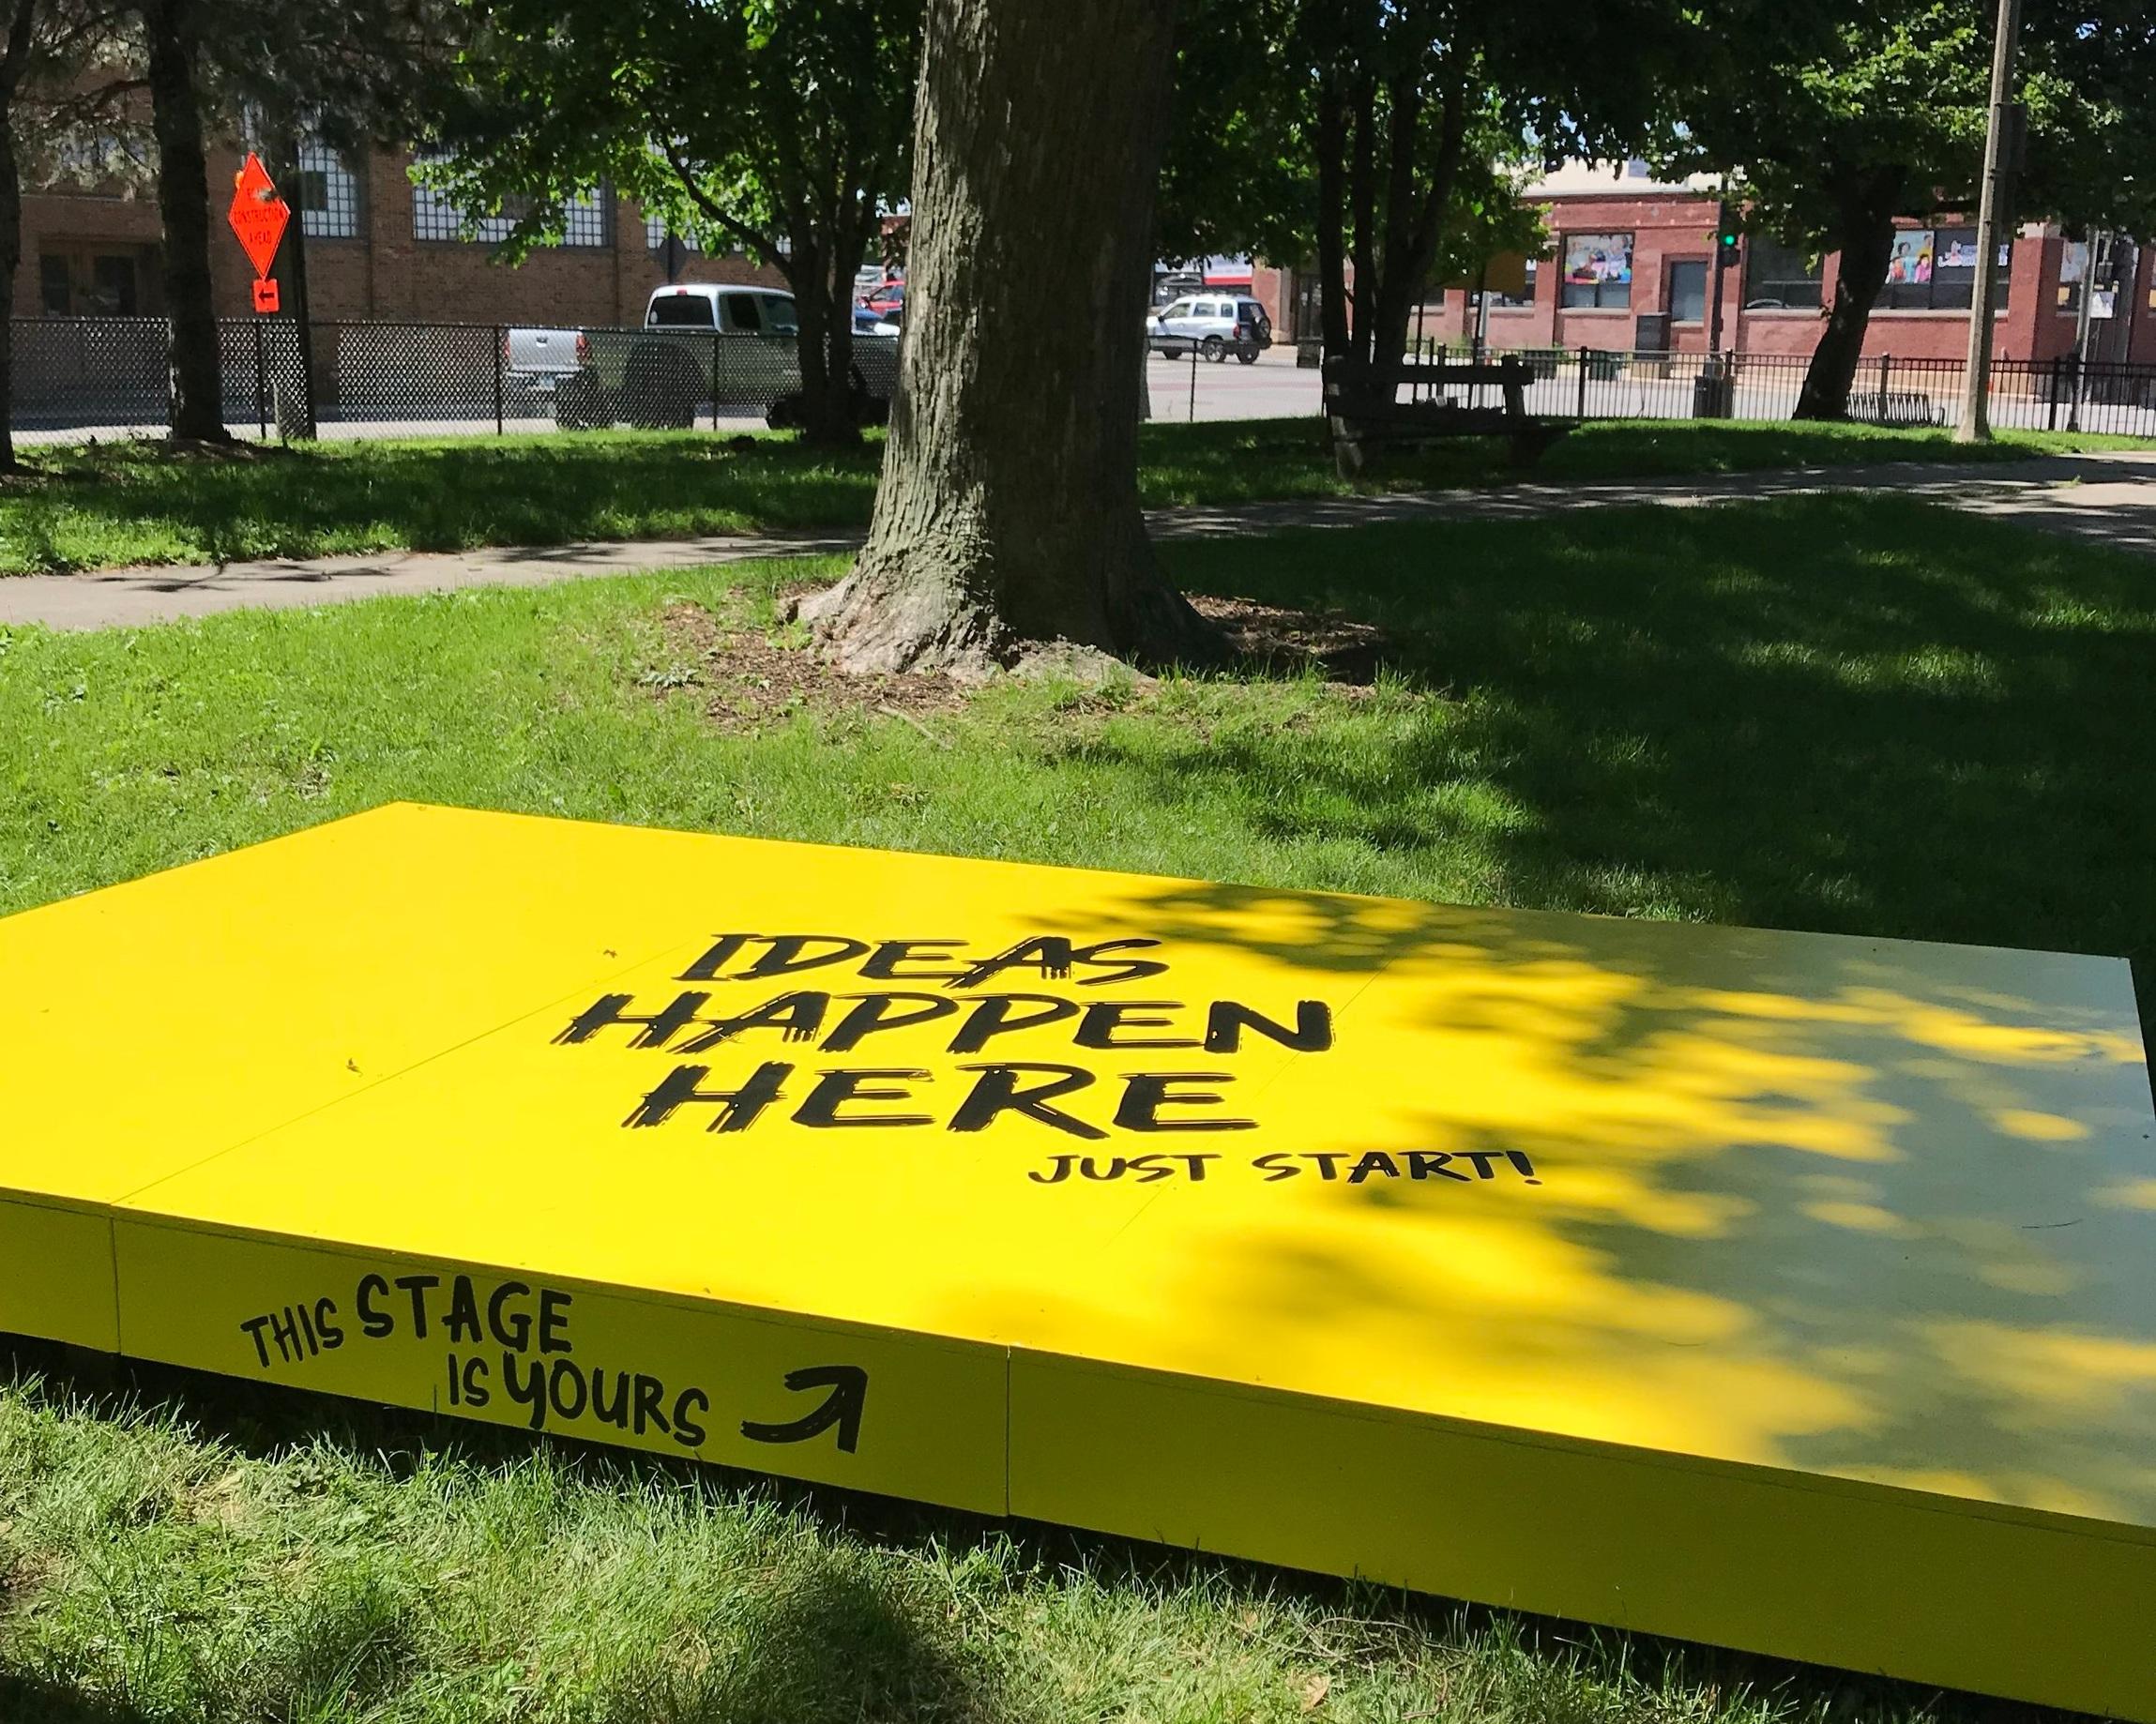 Revere Park: (2509 W. Irving Park Rd. Chicago, IL 60618)